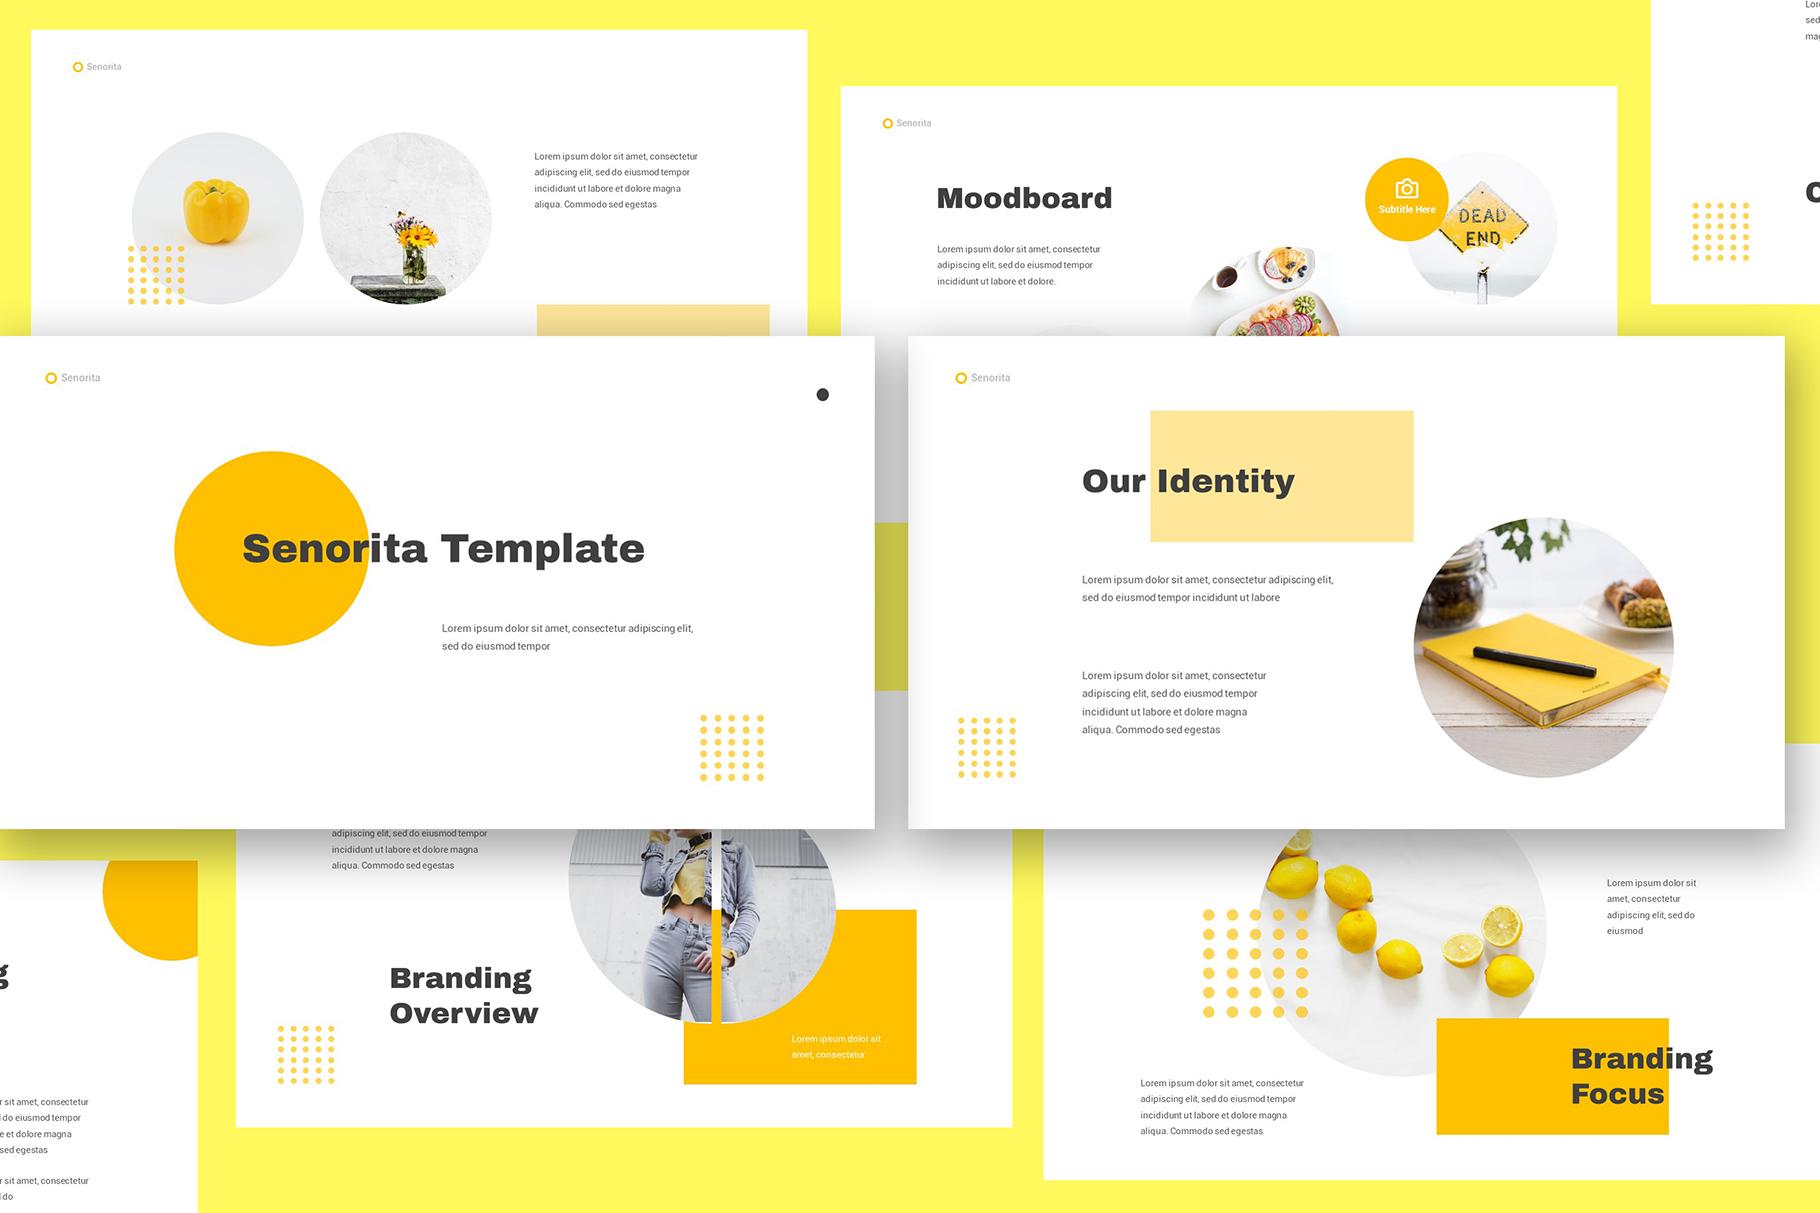 Senorita Brand Guideline Powerpoint example image 2